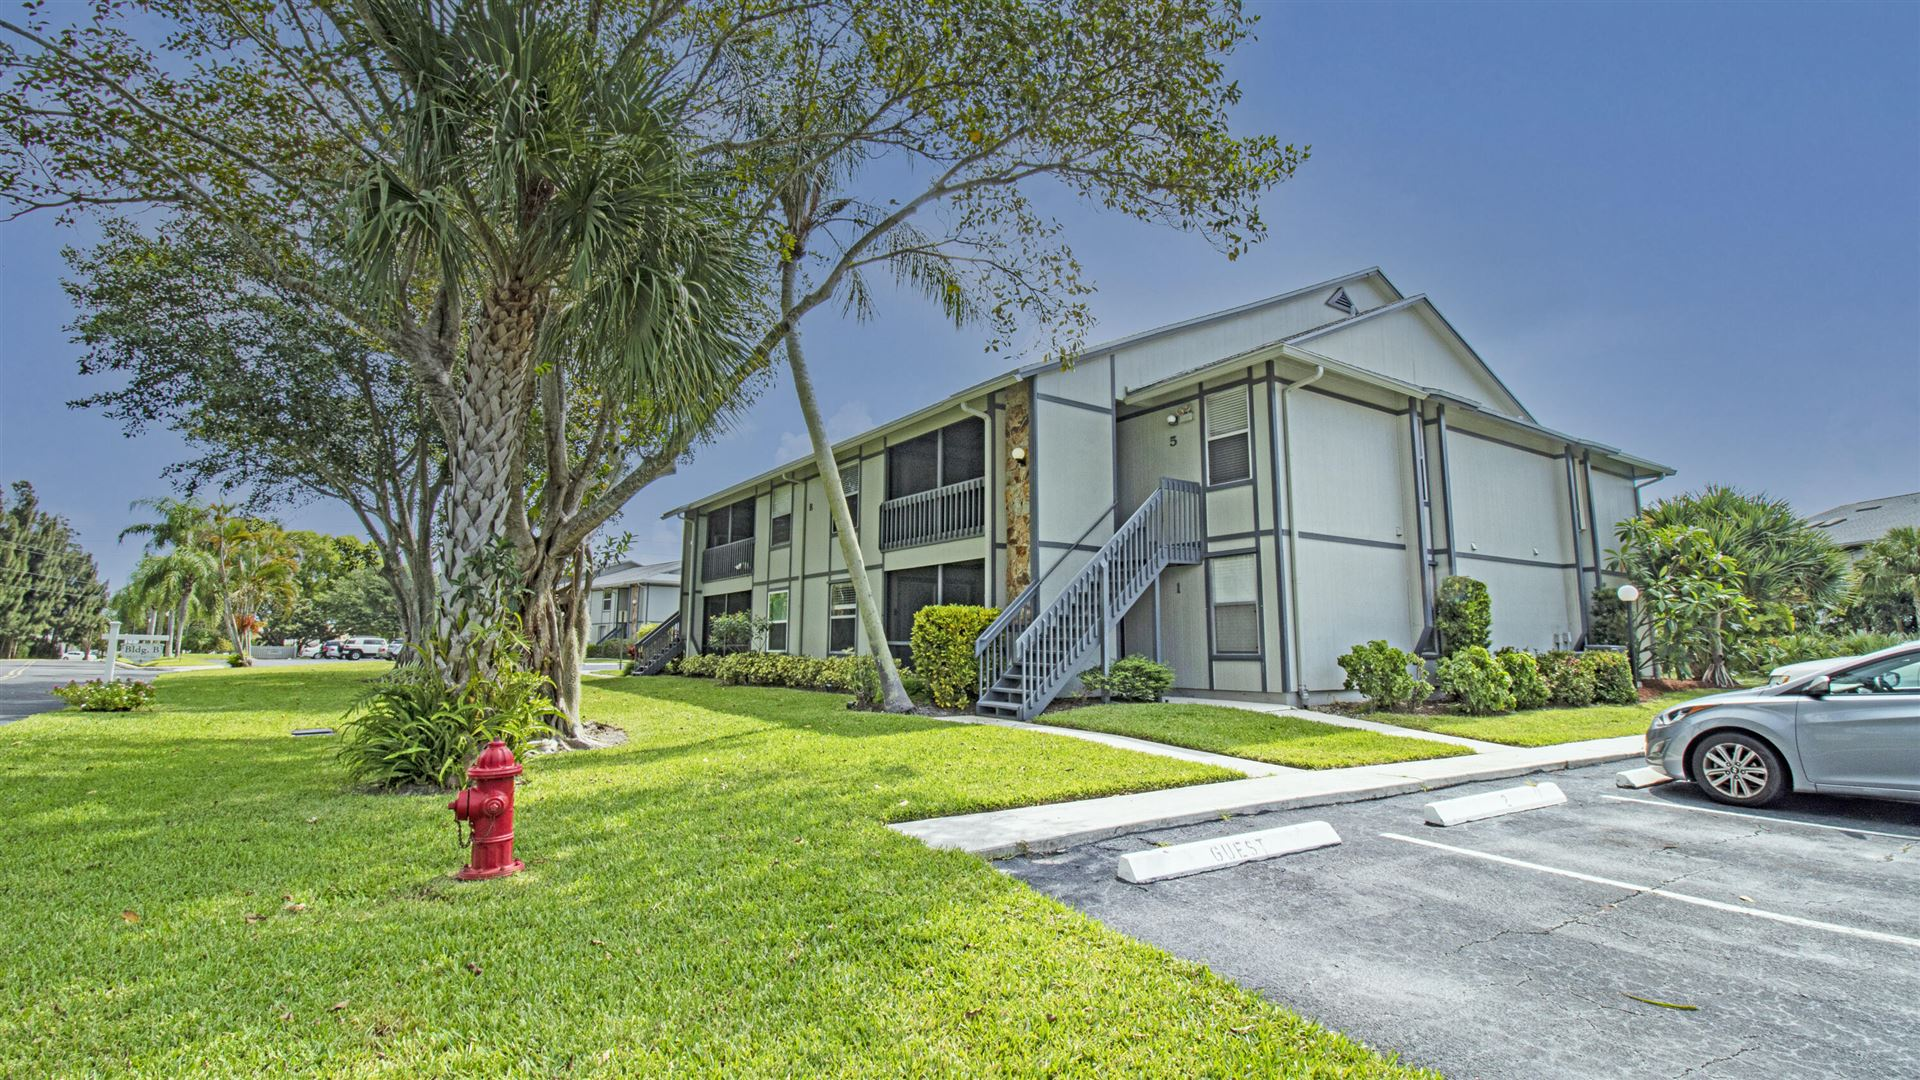 Photo of 8164 SE Croft Circle #5, Hobe Sound, FL 33455 (MLS # RX-10746036)